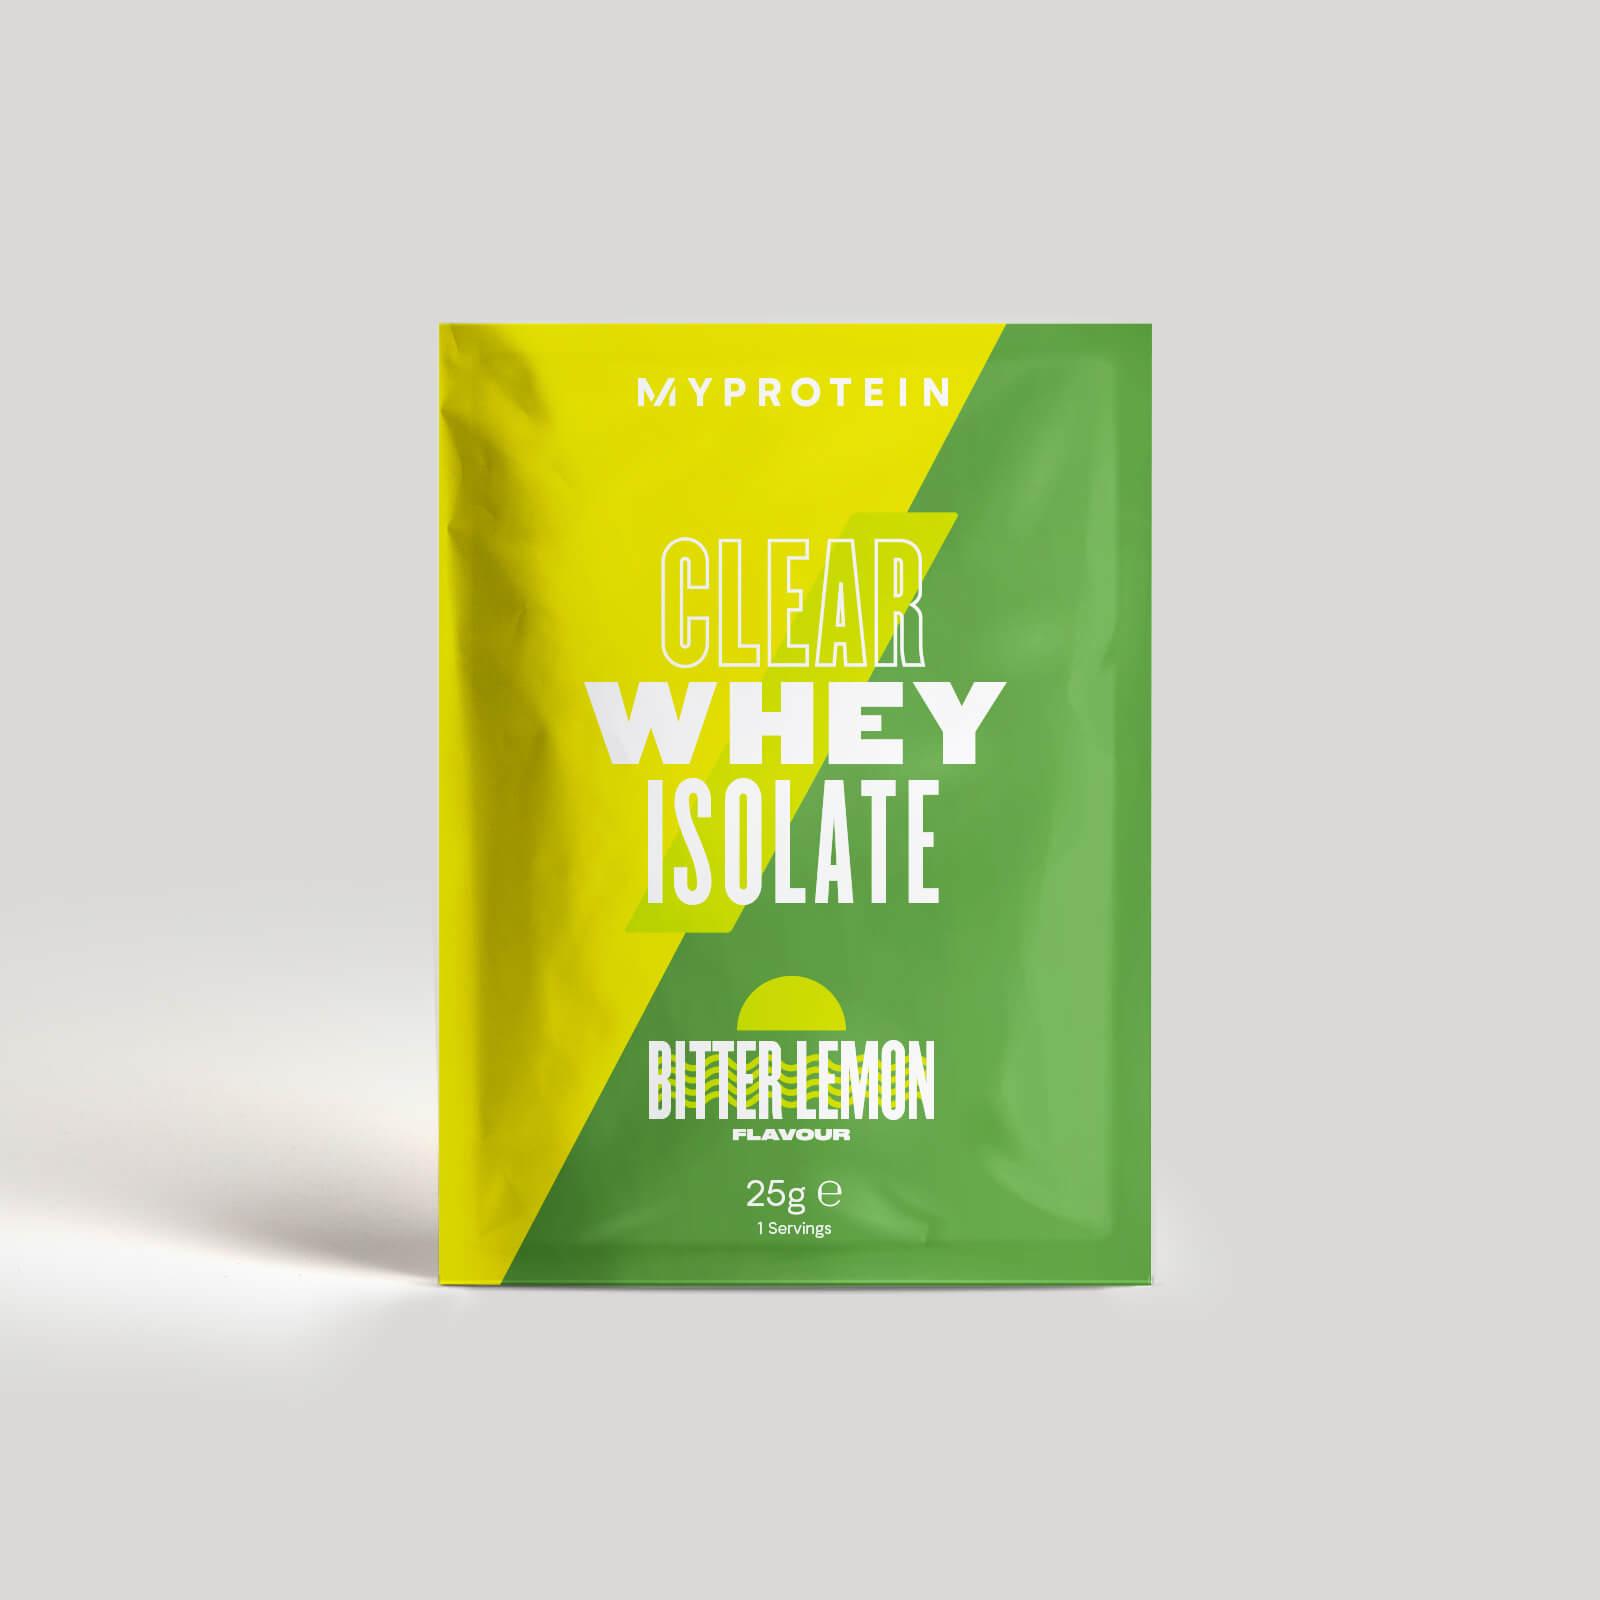 Myprotein Clear Whey Isolate (Échantillon) - 25g - Bitter Lemon